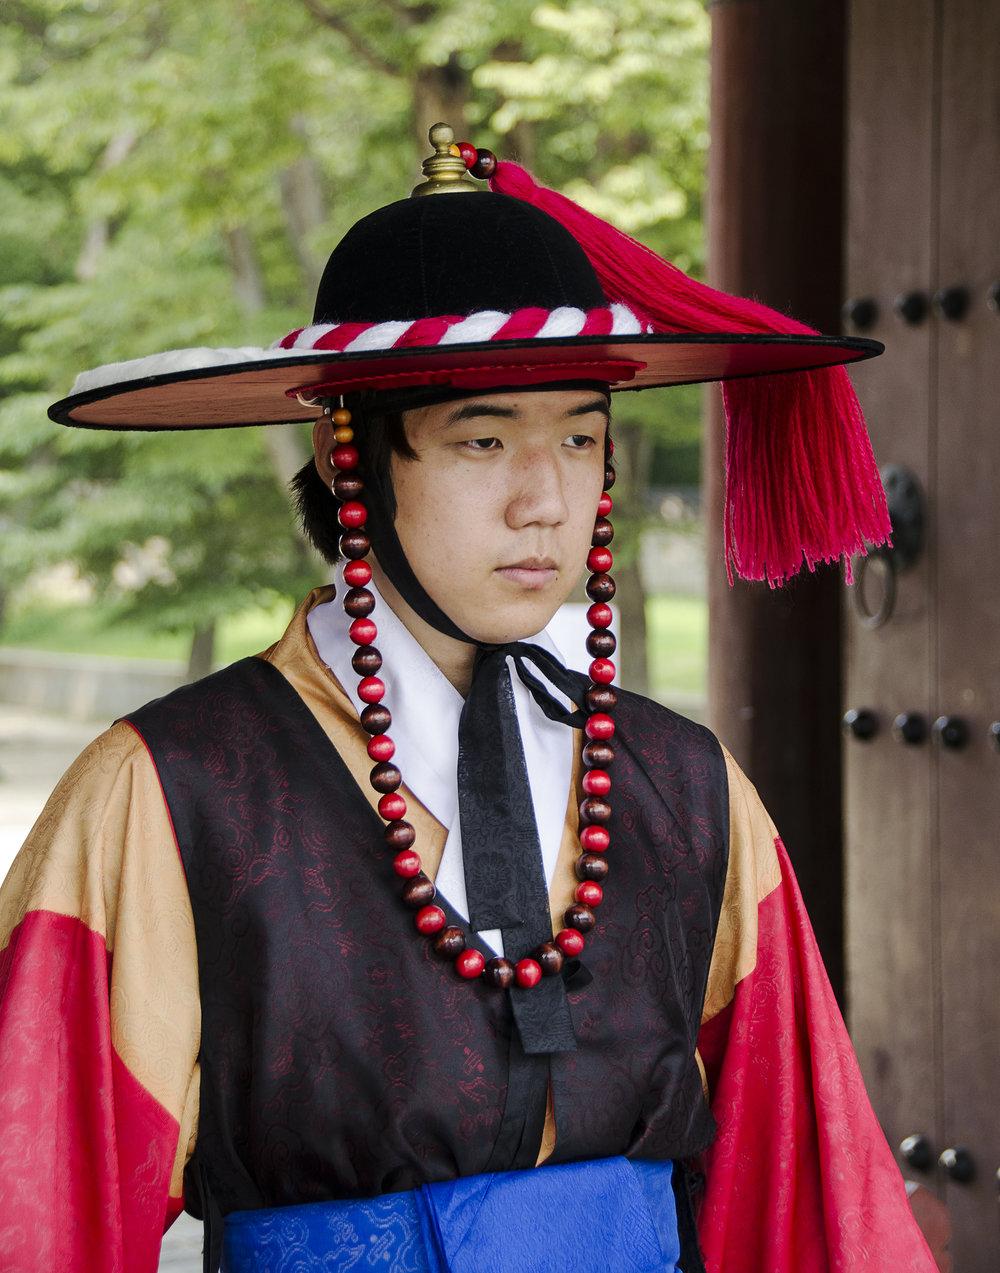 Spencer_Drake_Korean_Guard_Photography_korea_guard_hanok_village_traditional_people_travel.jpg